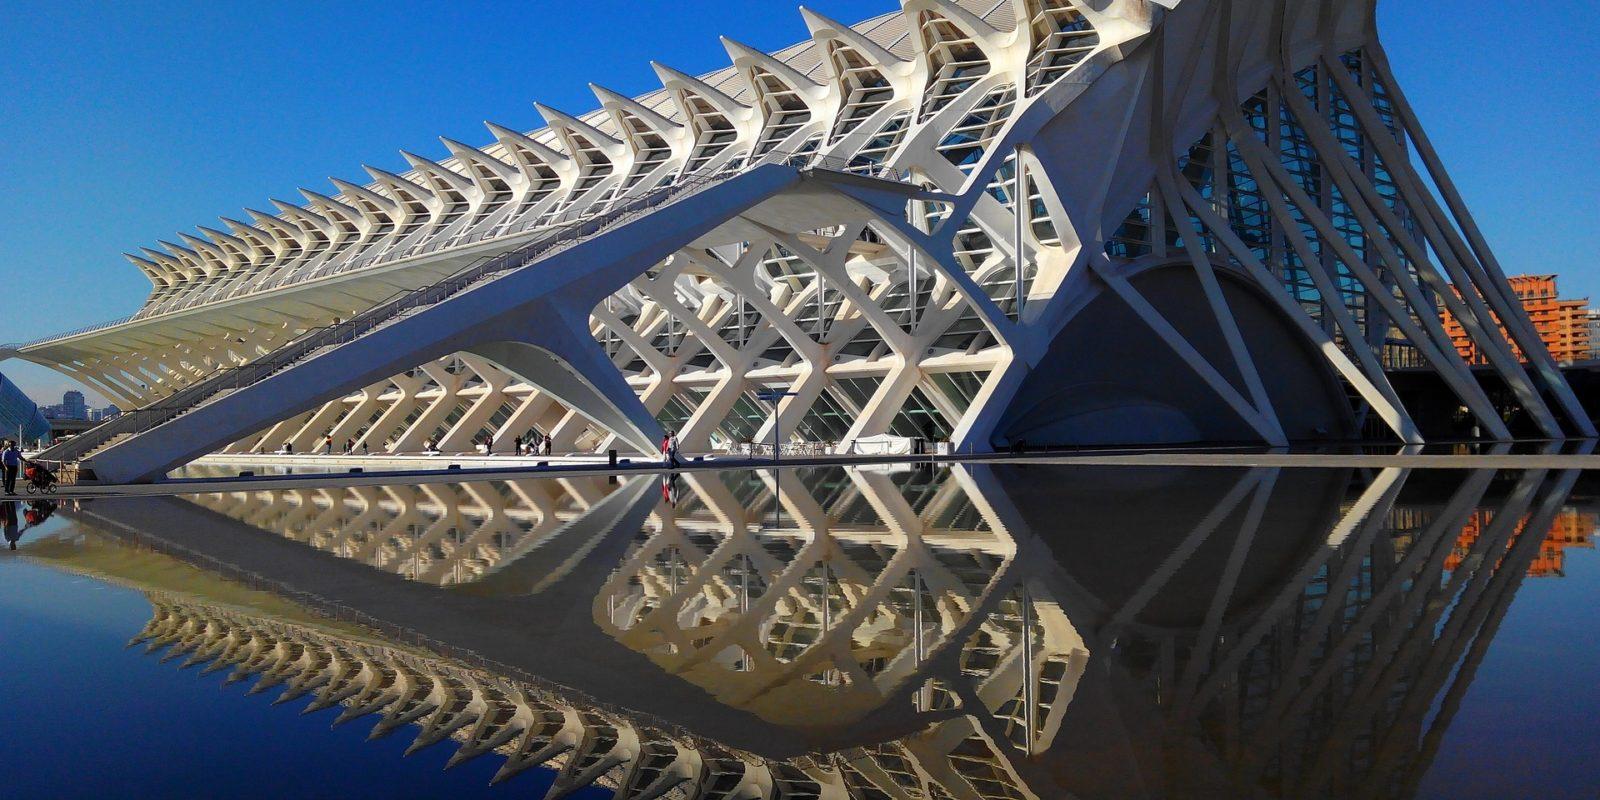 Santiago Calatrava Structures L'Umbracle, Valencia.